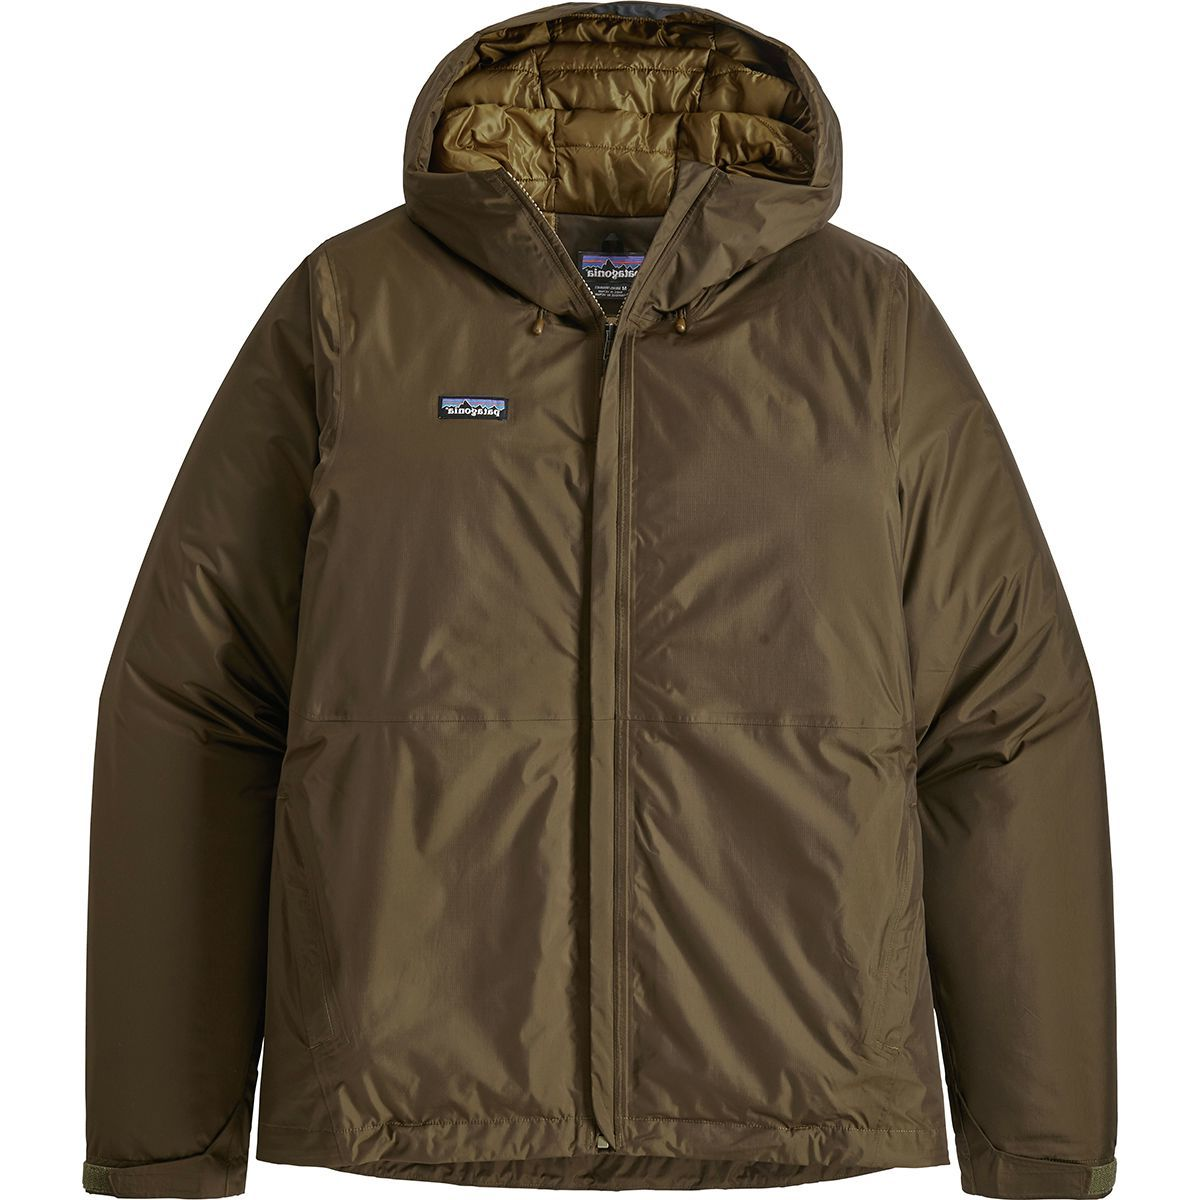 Patagonia Torrentshell Insulated Jacket - Men's